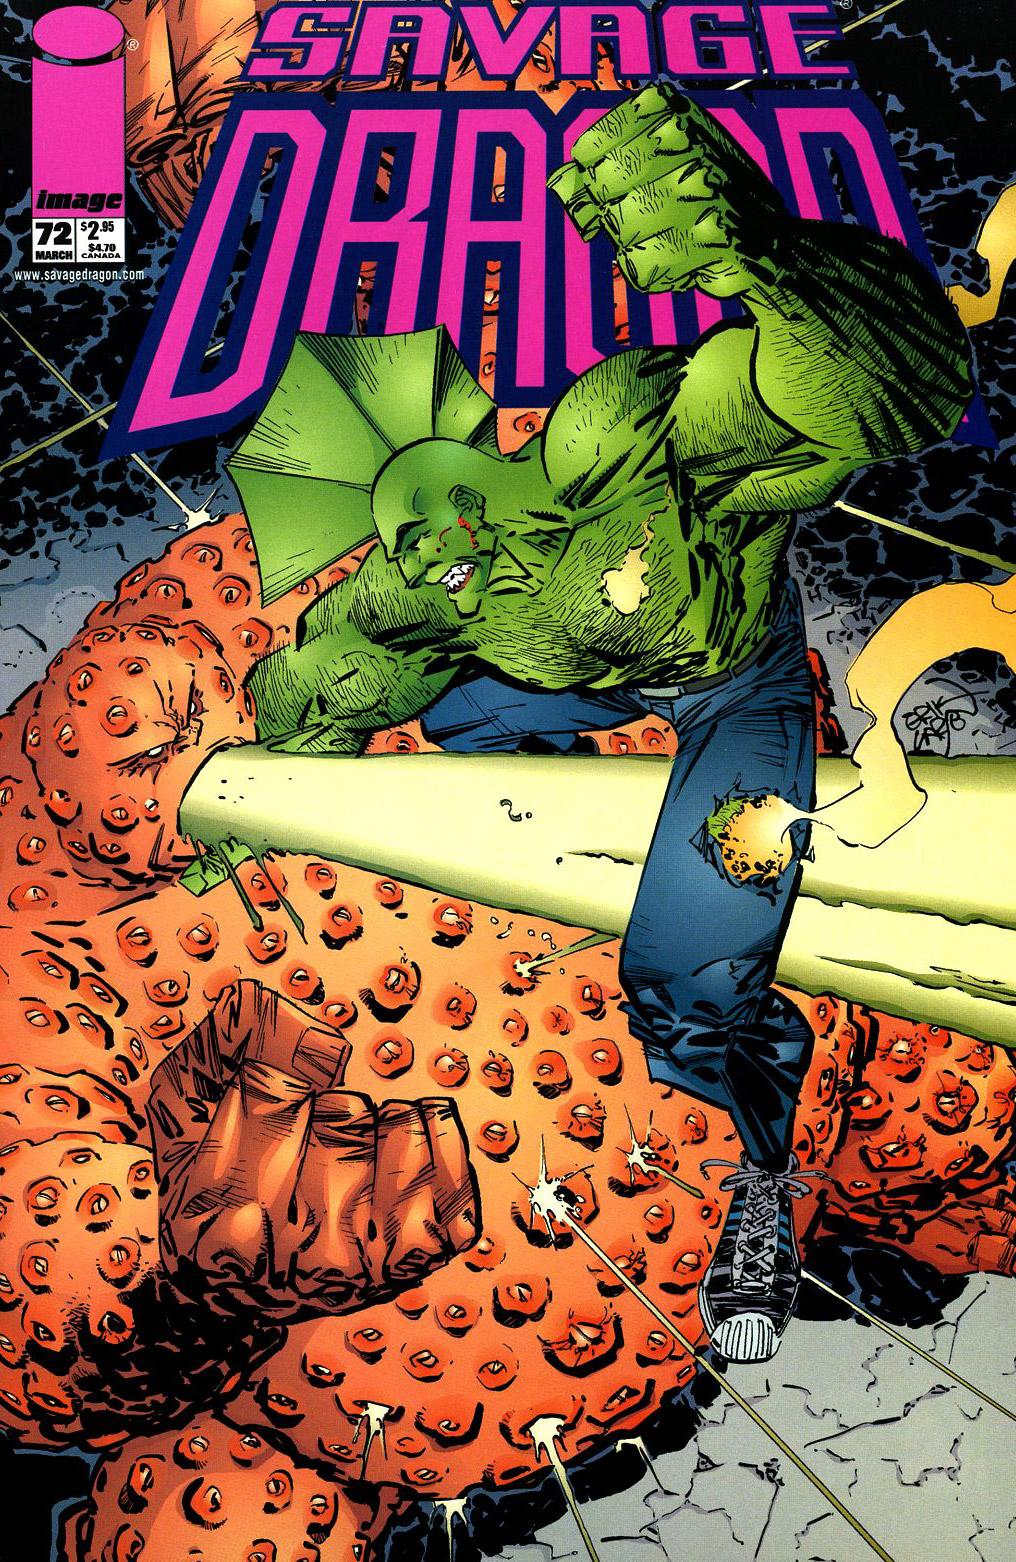 Cover Savage Dragon Vol.2 #72